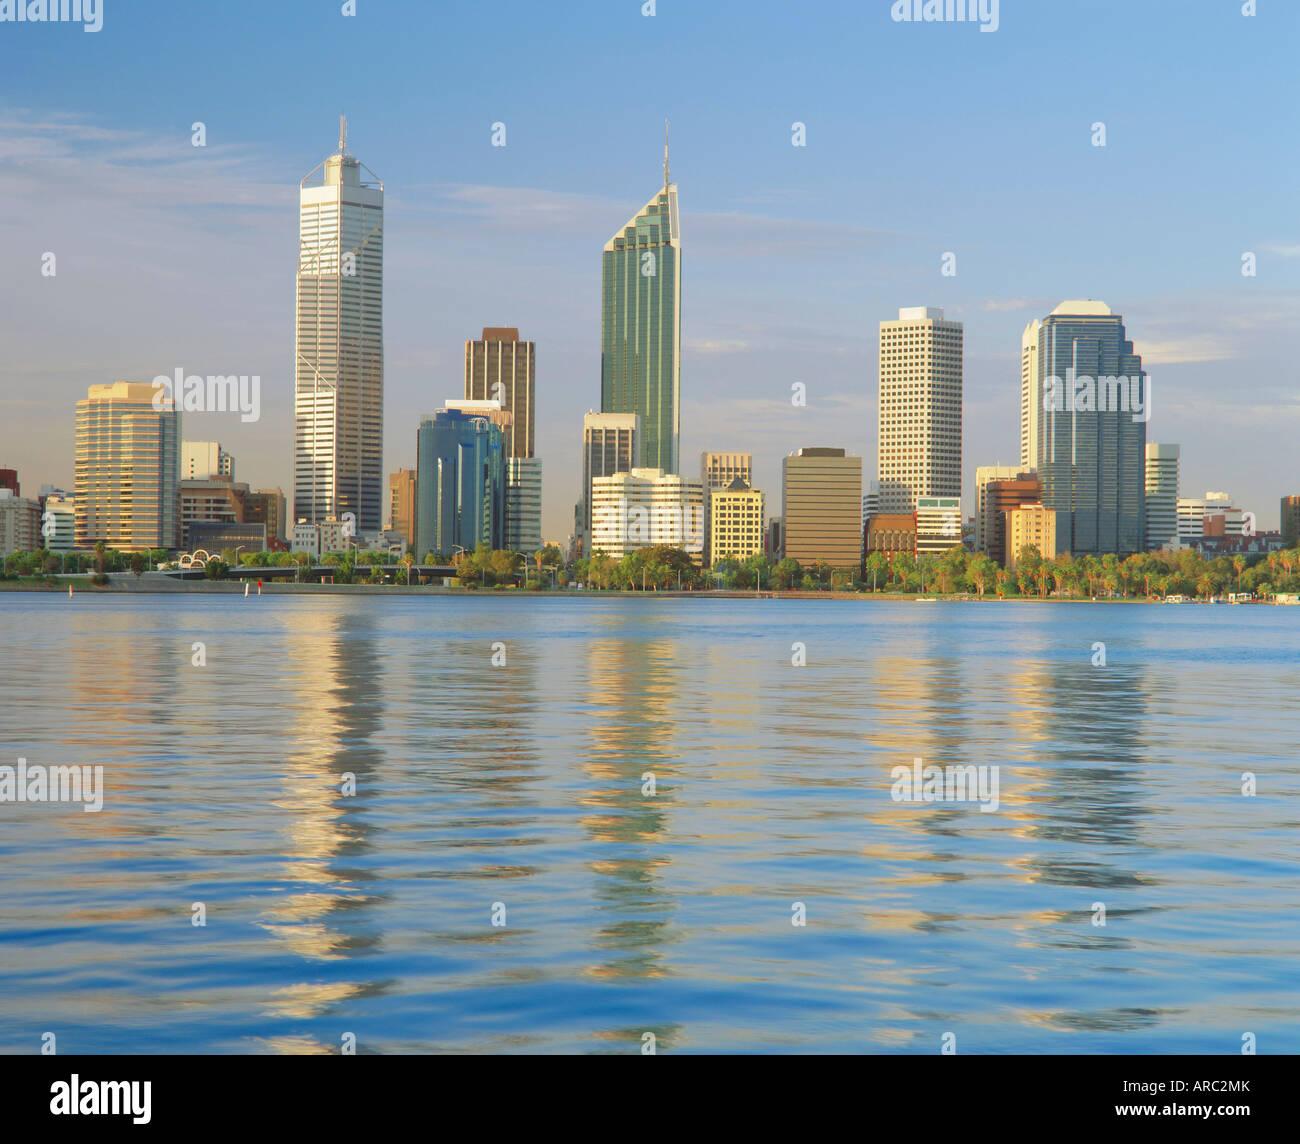 City skyline, Perth, Western Australia, Australia - Stock Image